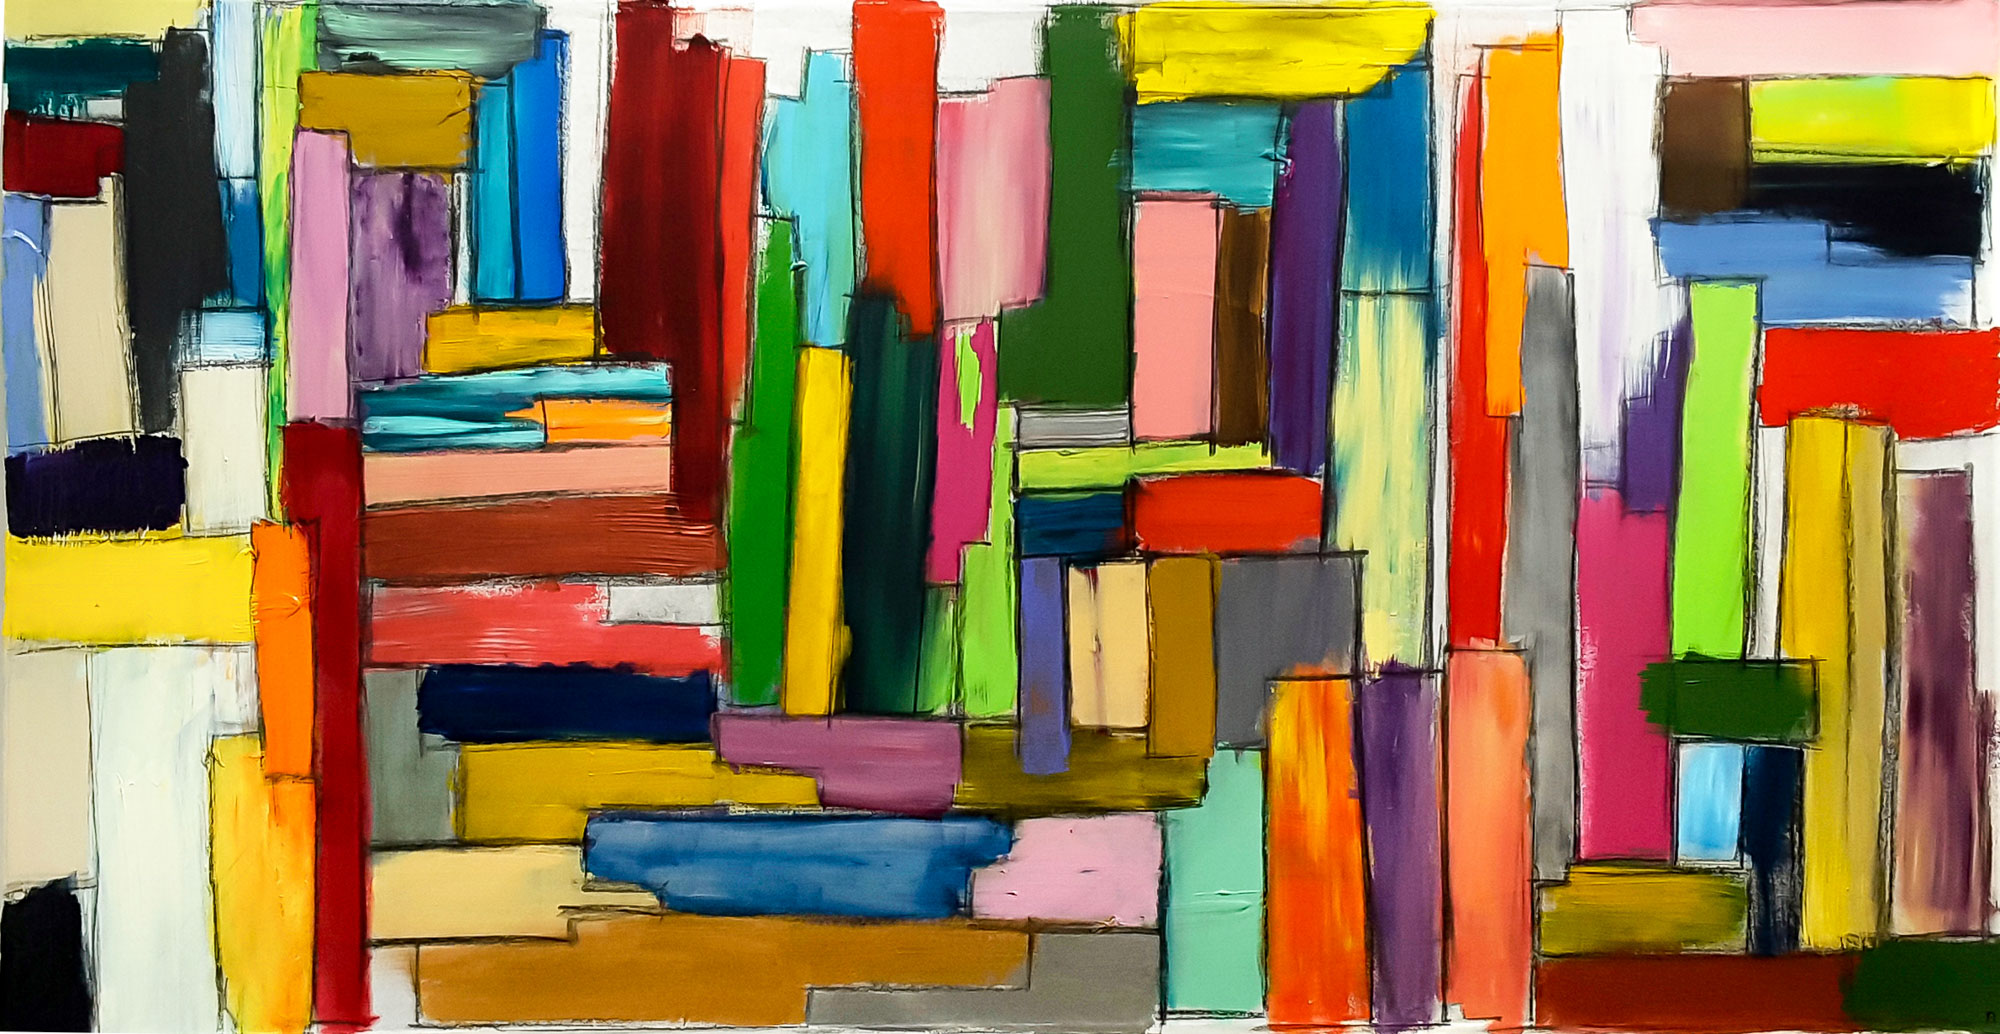 La Ville Ensemble - 76x145 cm